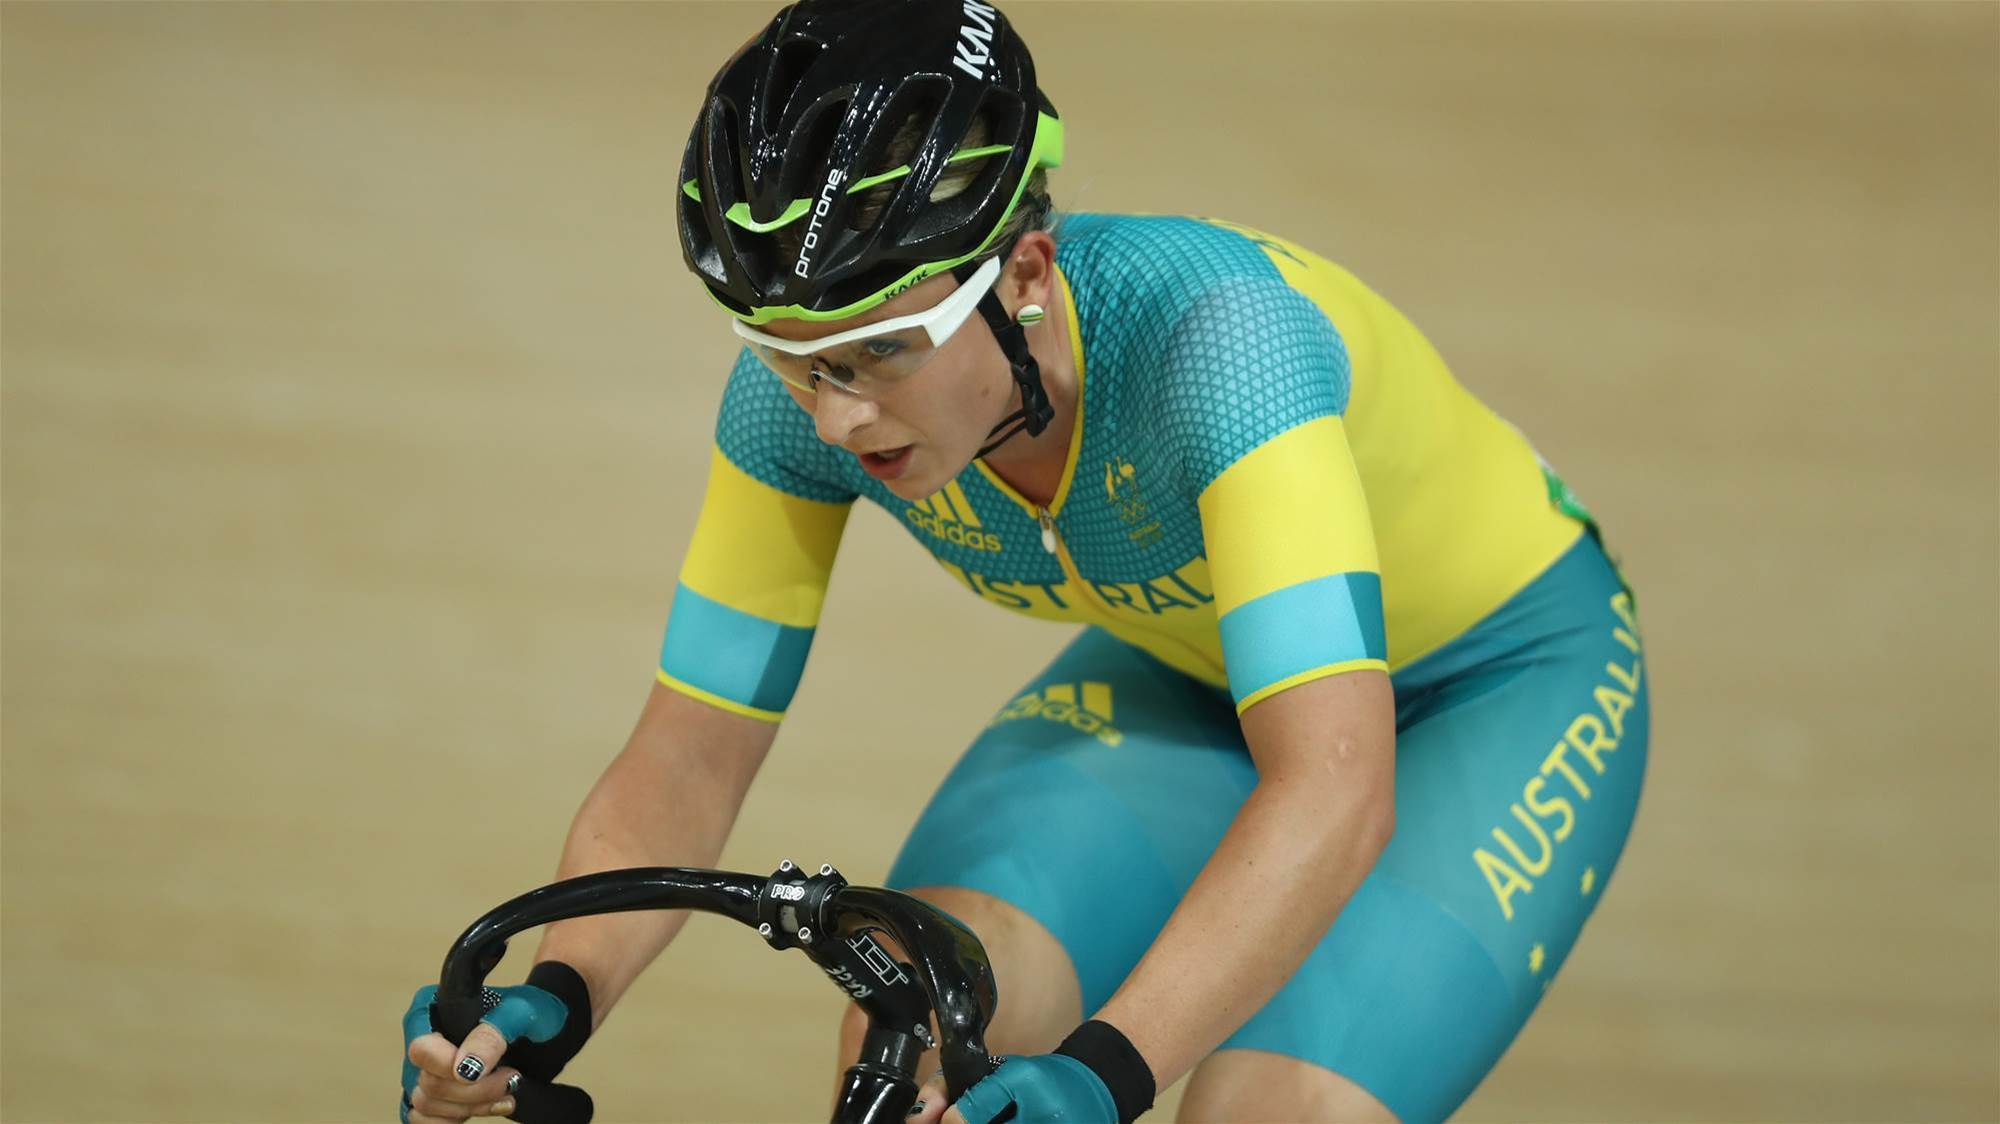 Edmondson: Australia's track cyclist ready to rival England